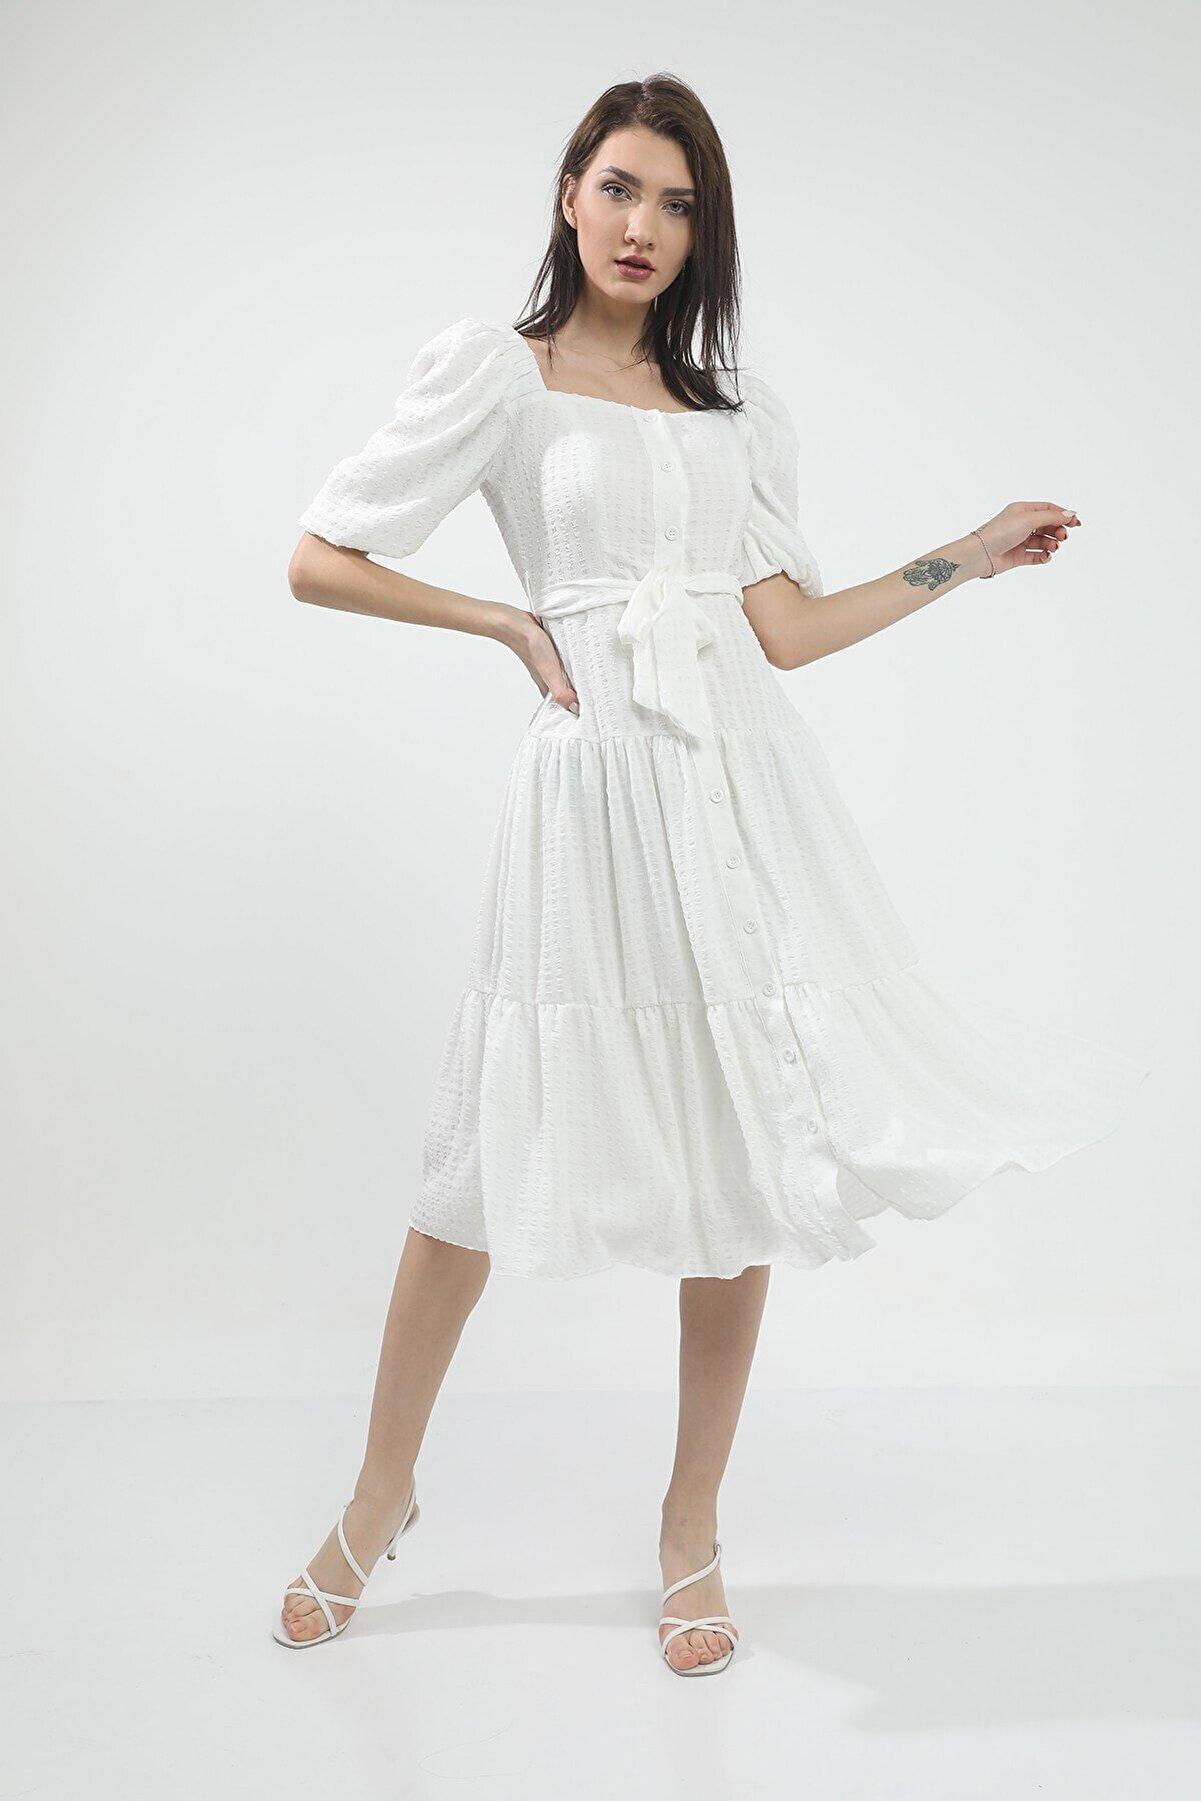 MANGOSTEEN Beyaz Kare Yaka Uzun Elbise